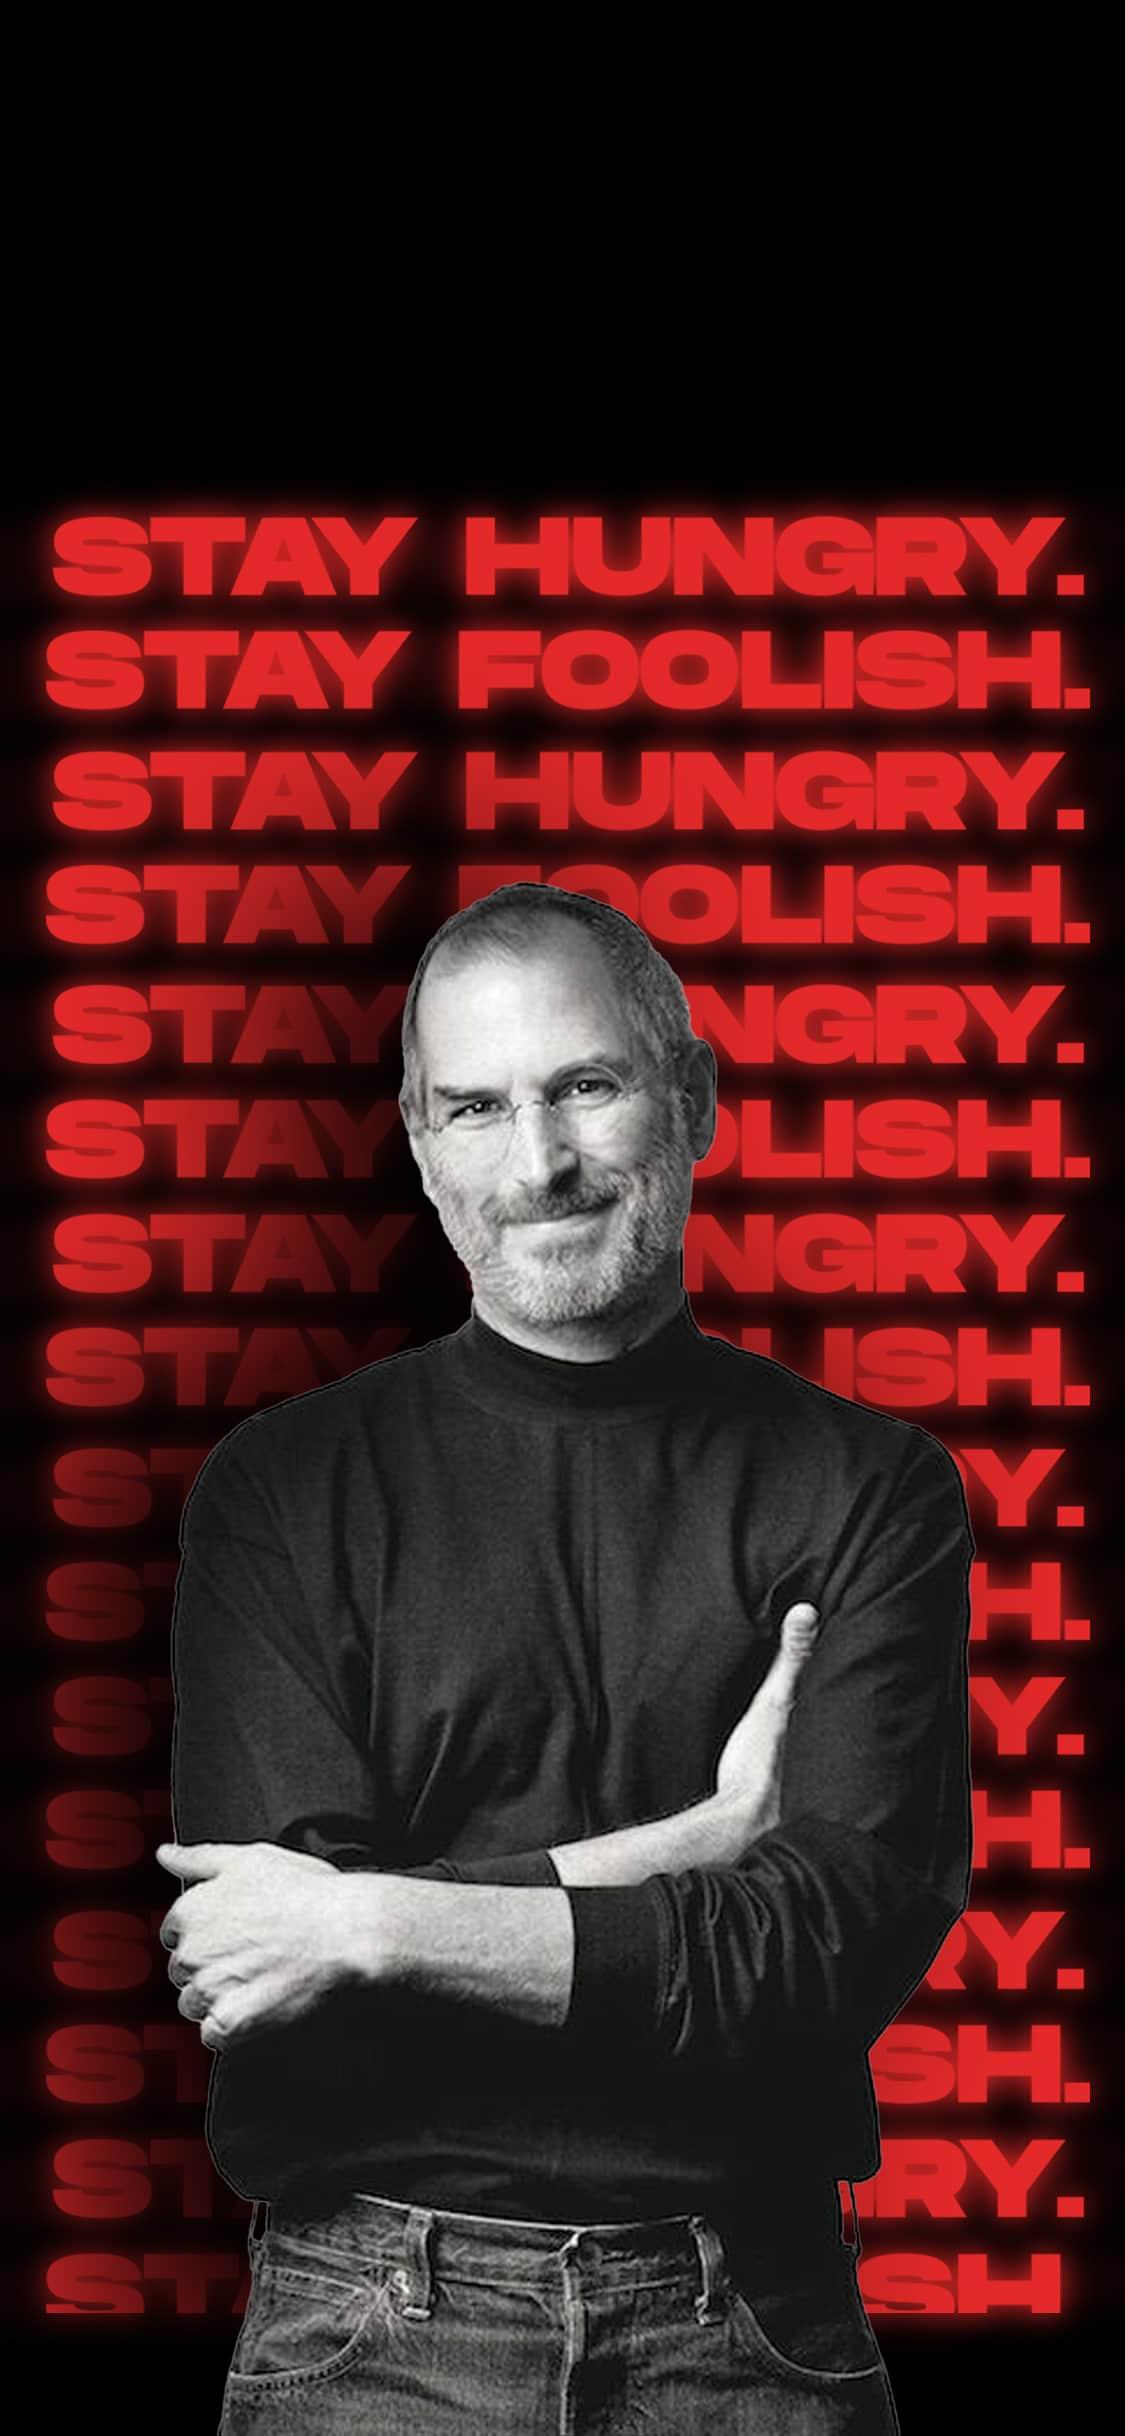 Steve Jobs Inspiring quote 2